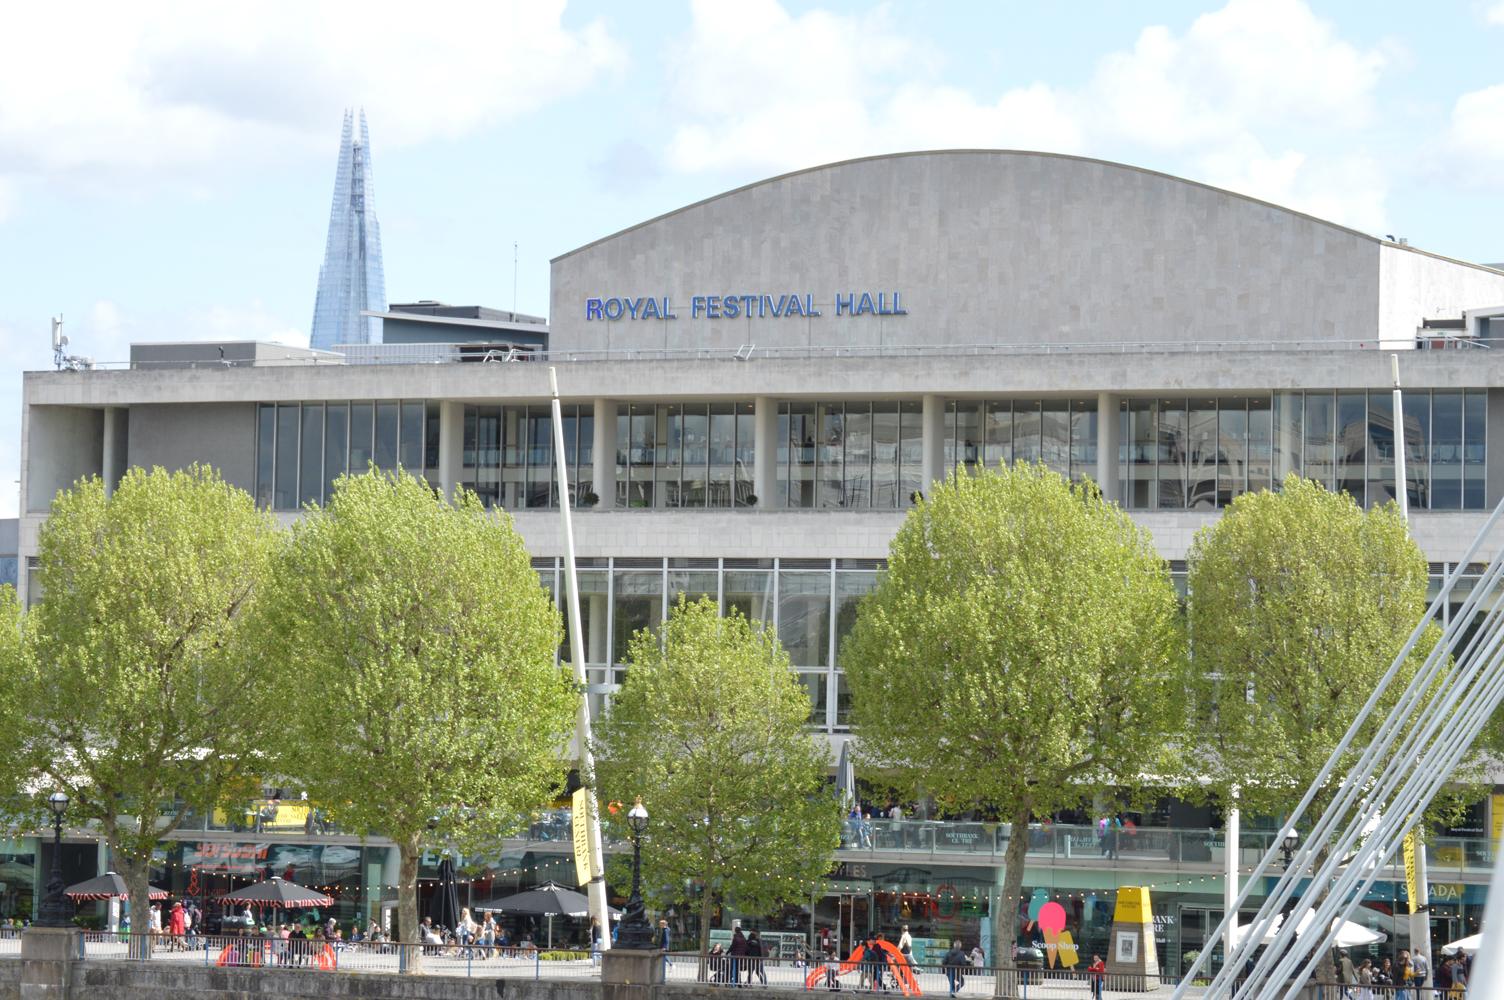 037 Royal Festival Hall. 26.04.2019